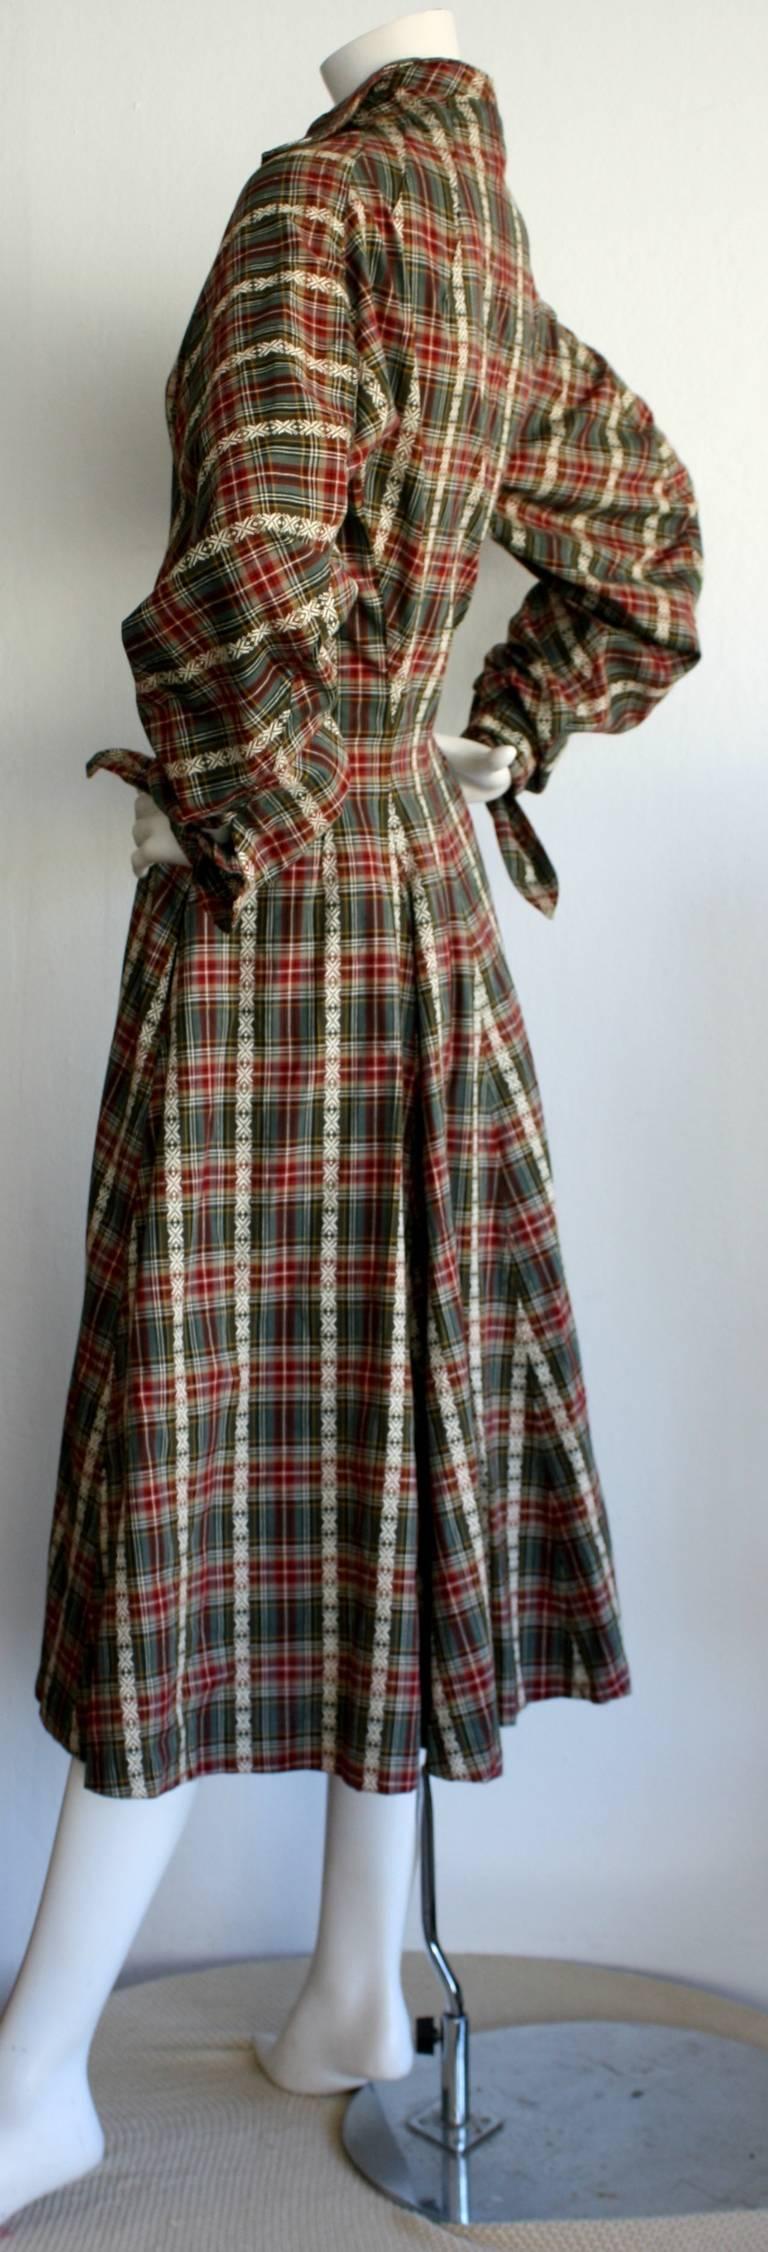 Women's Vintage Byron Lars Tartan Plaid Tie Bow Shirt Dress For Sale